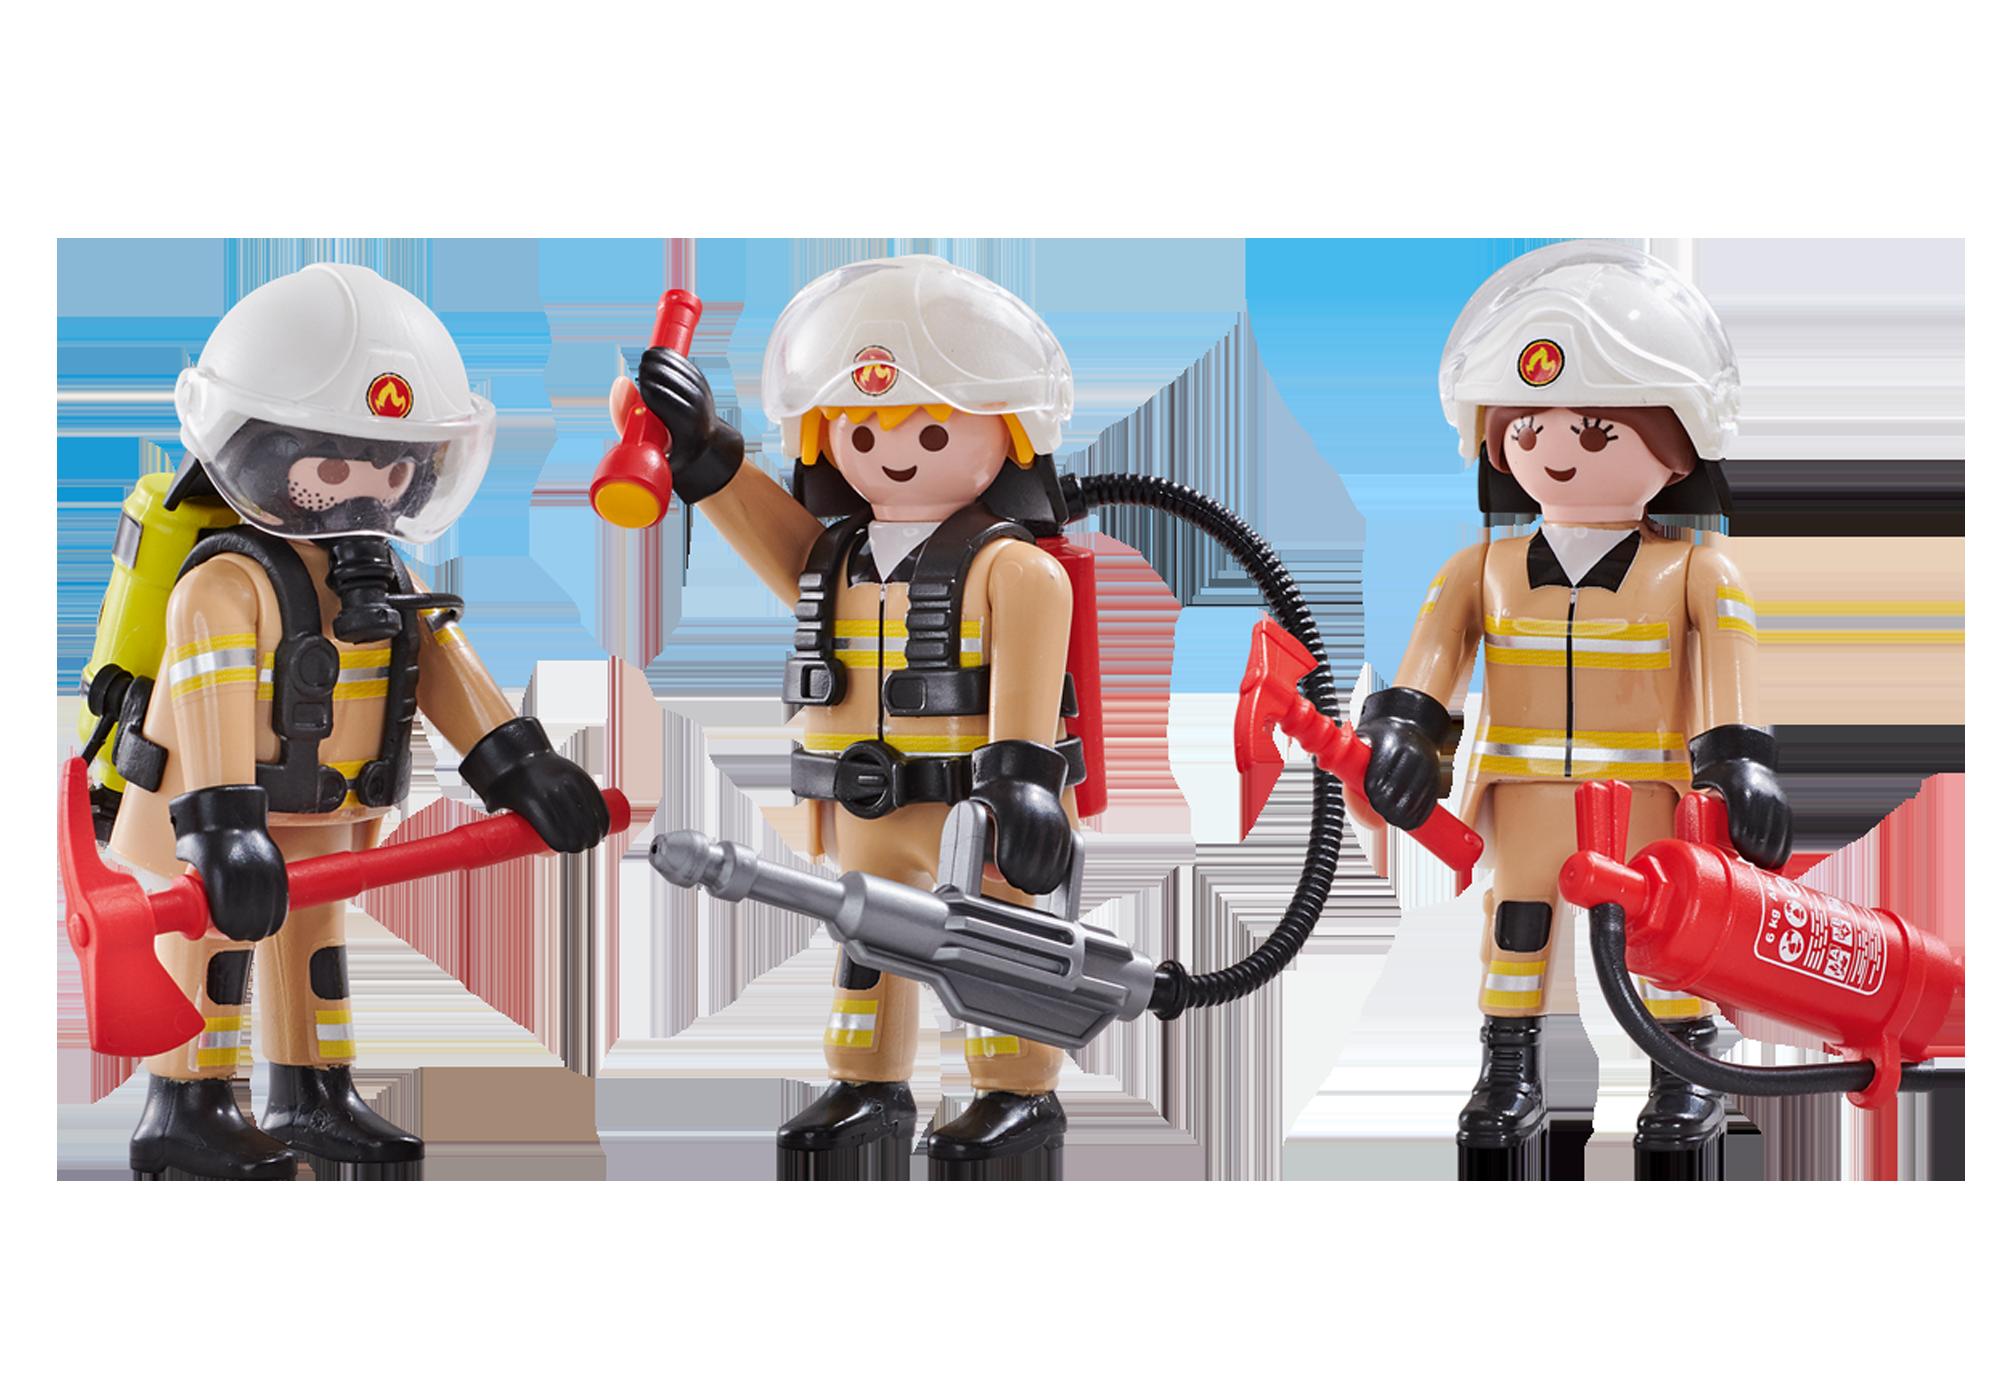 http://media.playmobil.com/i/playmobil/6584_product_detail/Ειδική Ομάδα Πυροσβεστών Α